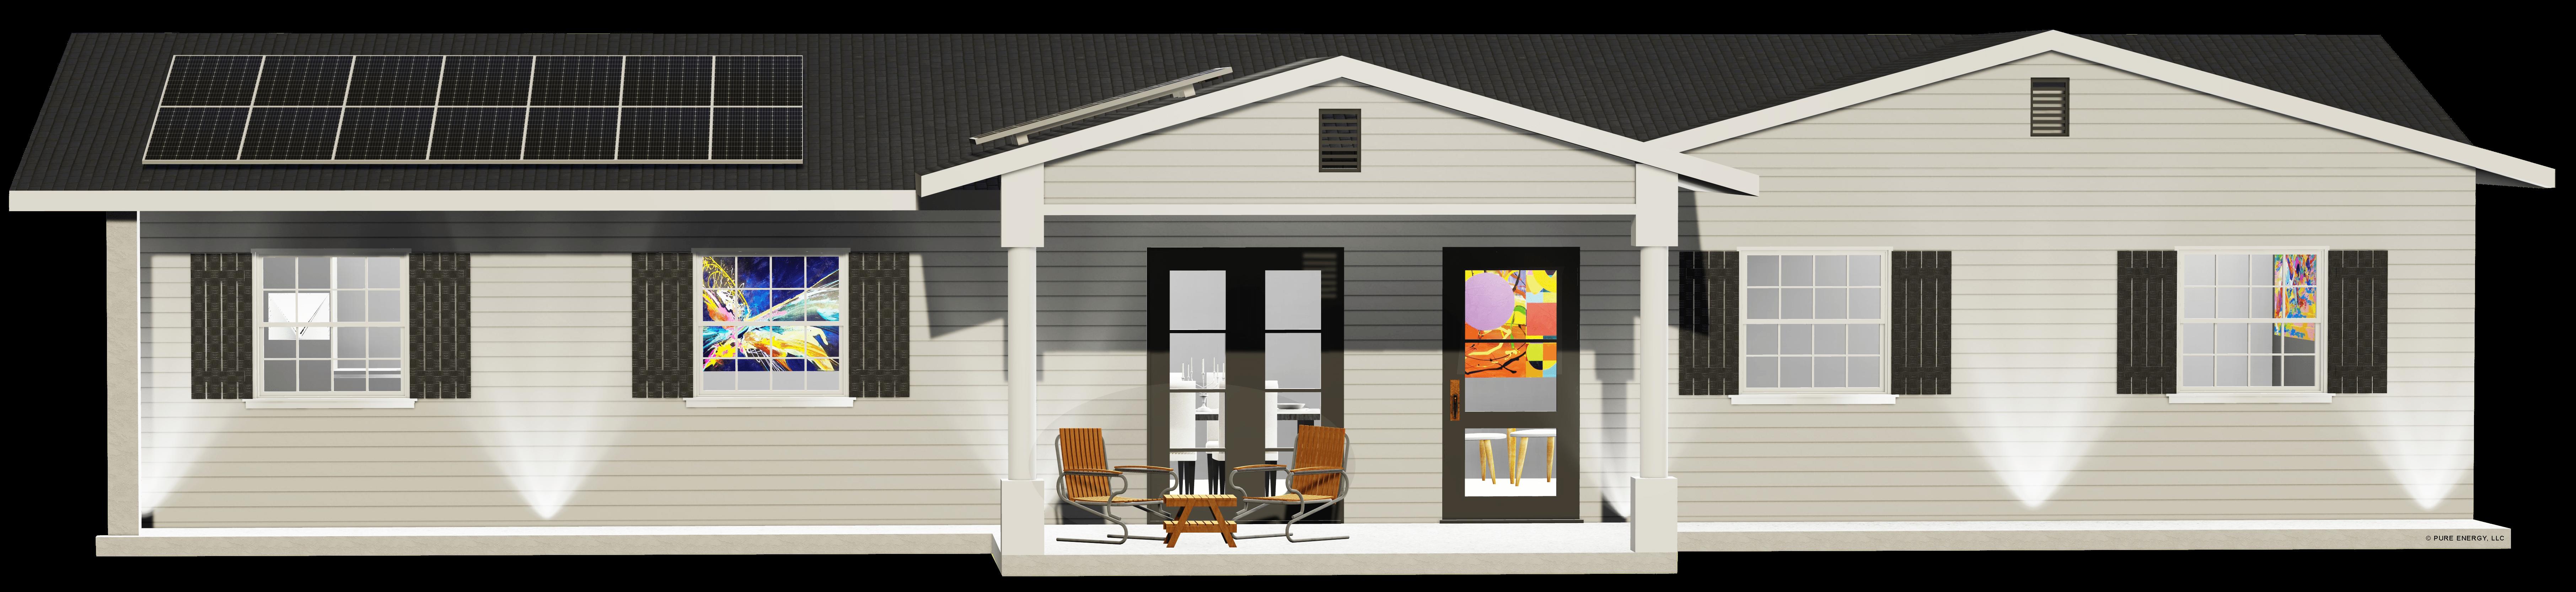 White-luxury-house-with-solar-panels--1